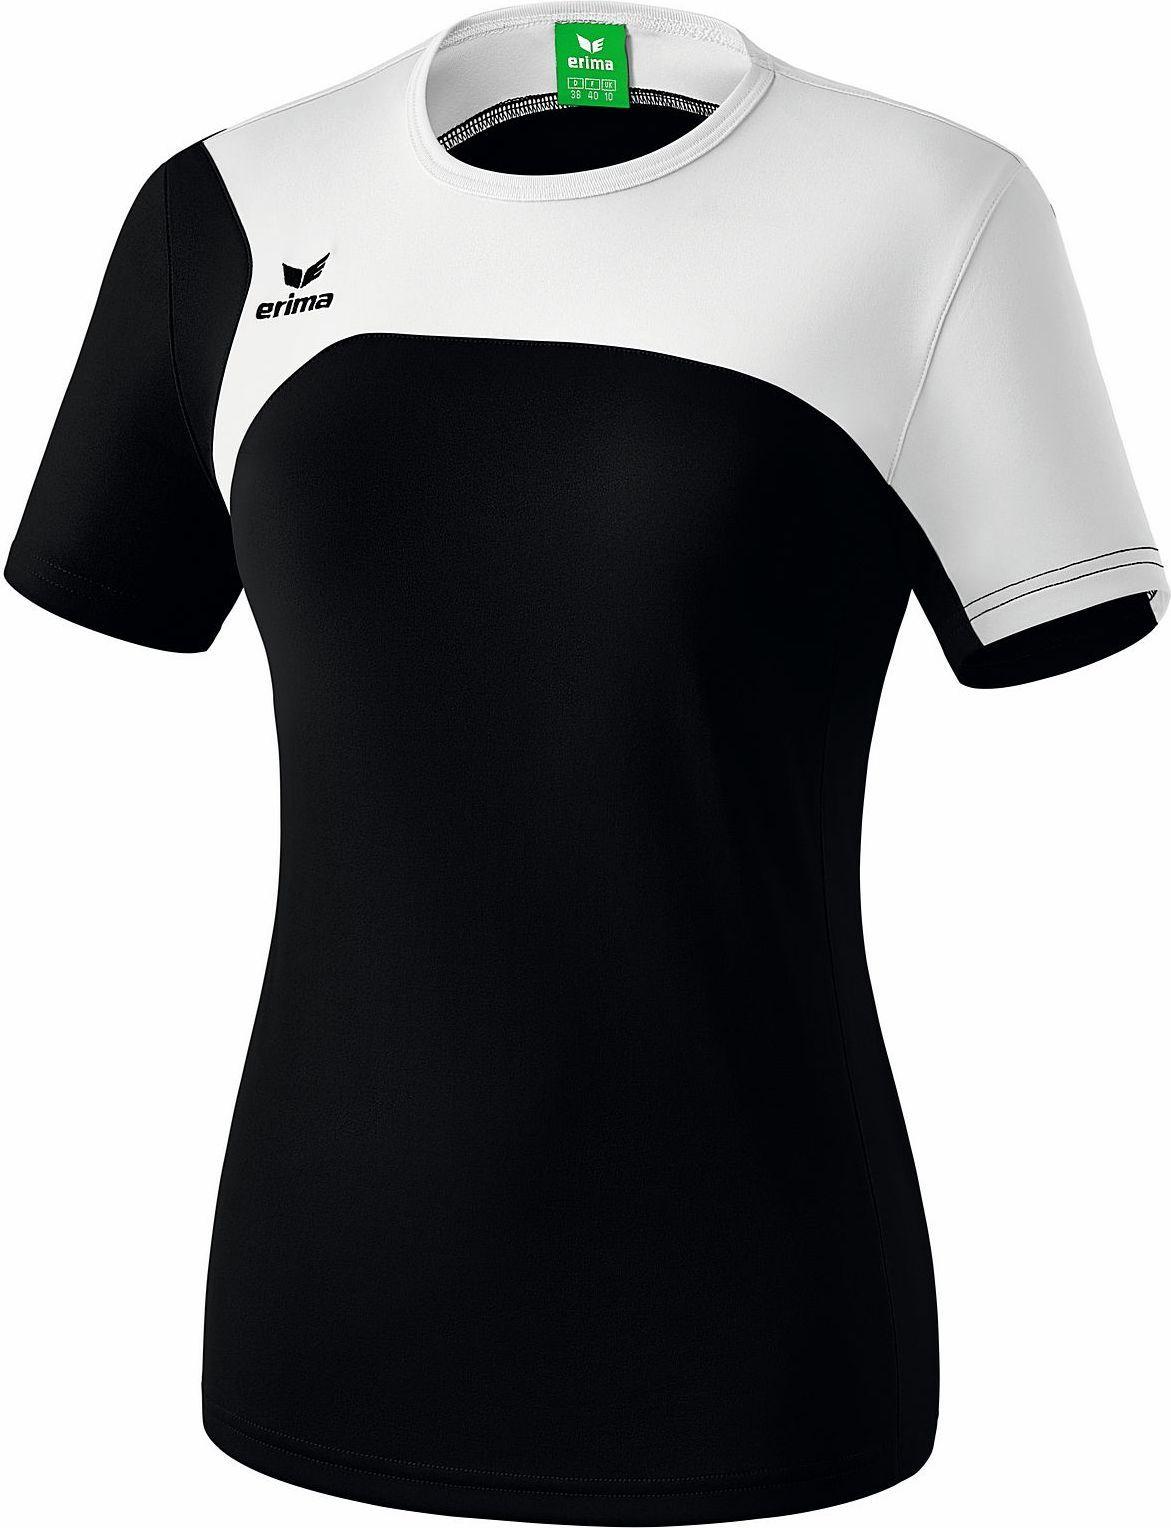 75c6f0d9ad5 Erima Club 1900 2.0 T-Shirt Dames - Zwart / Wit